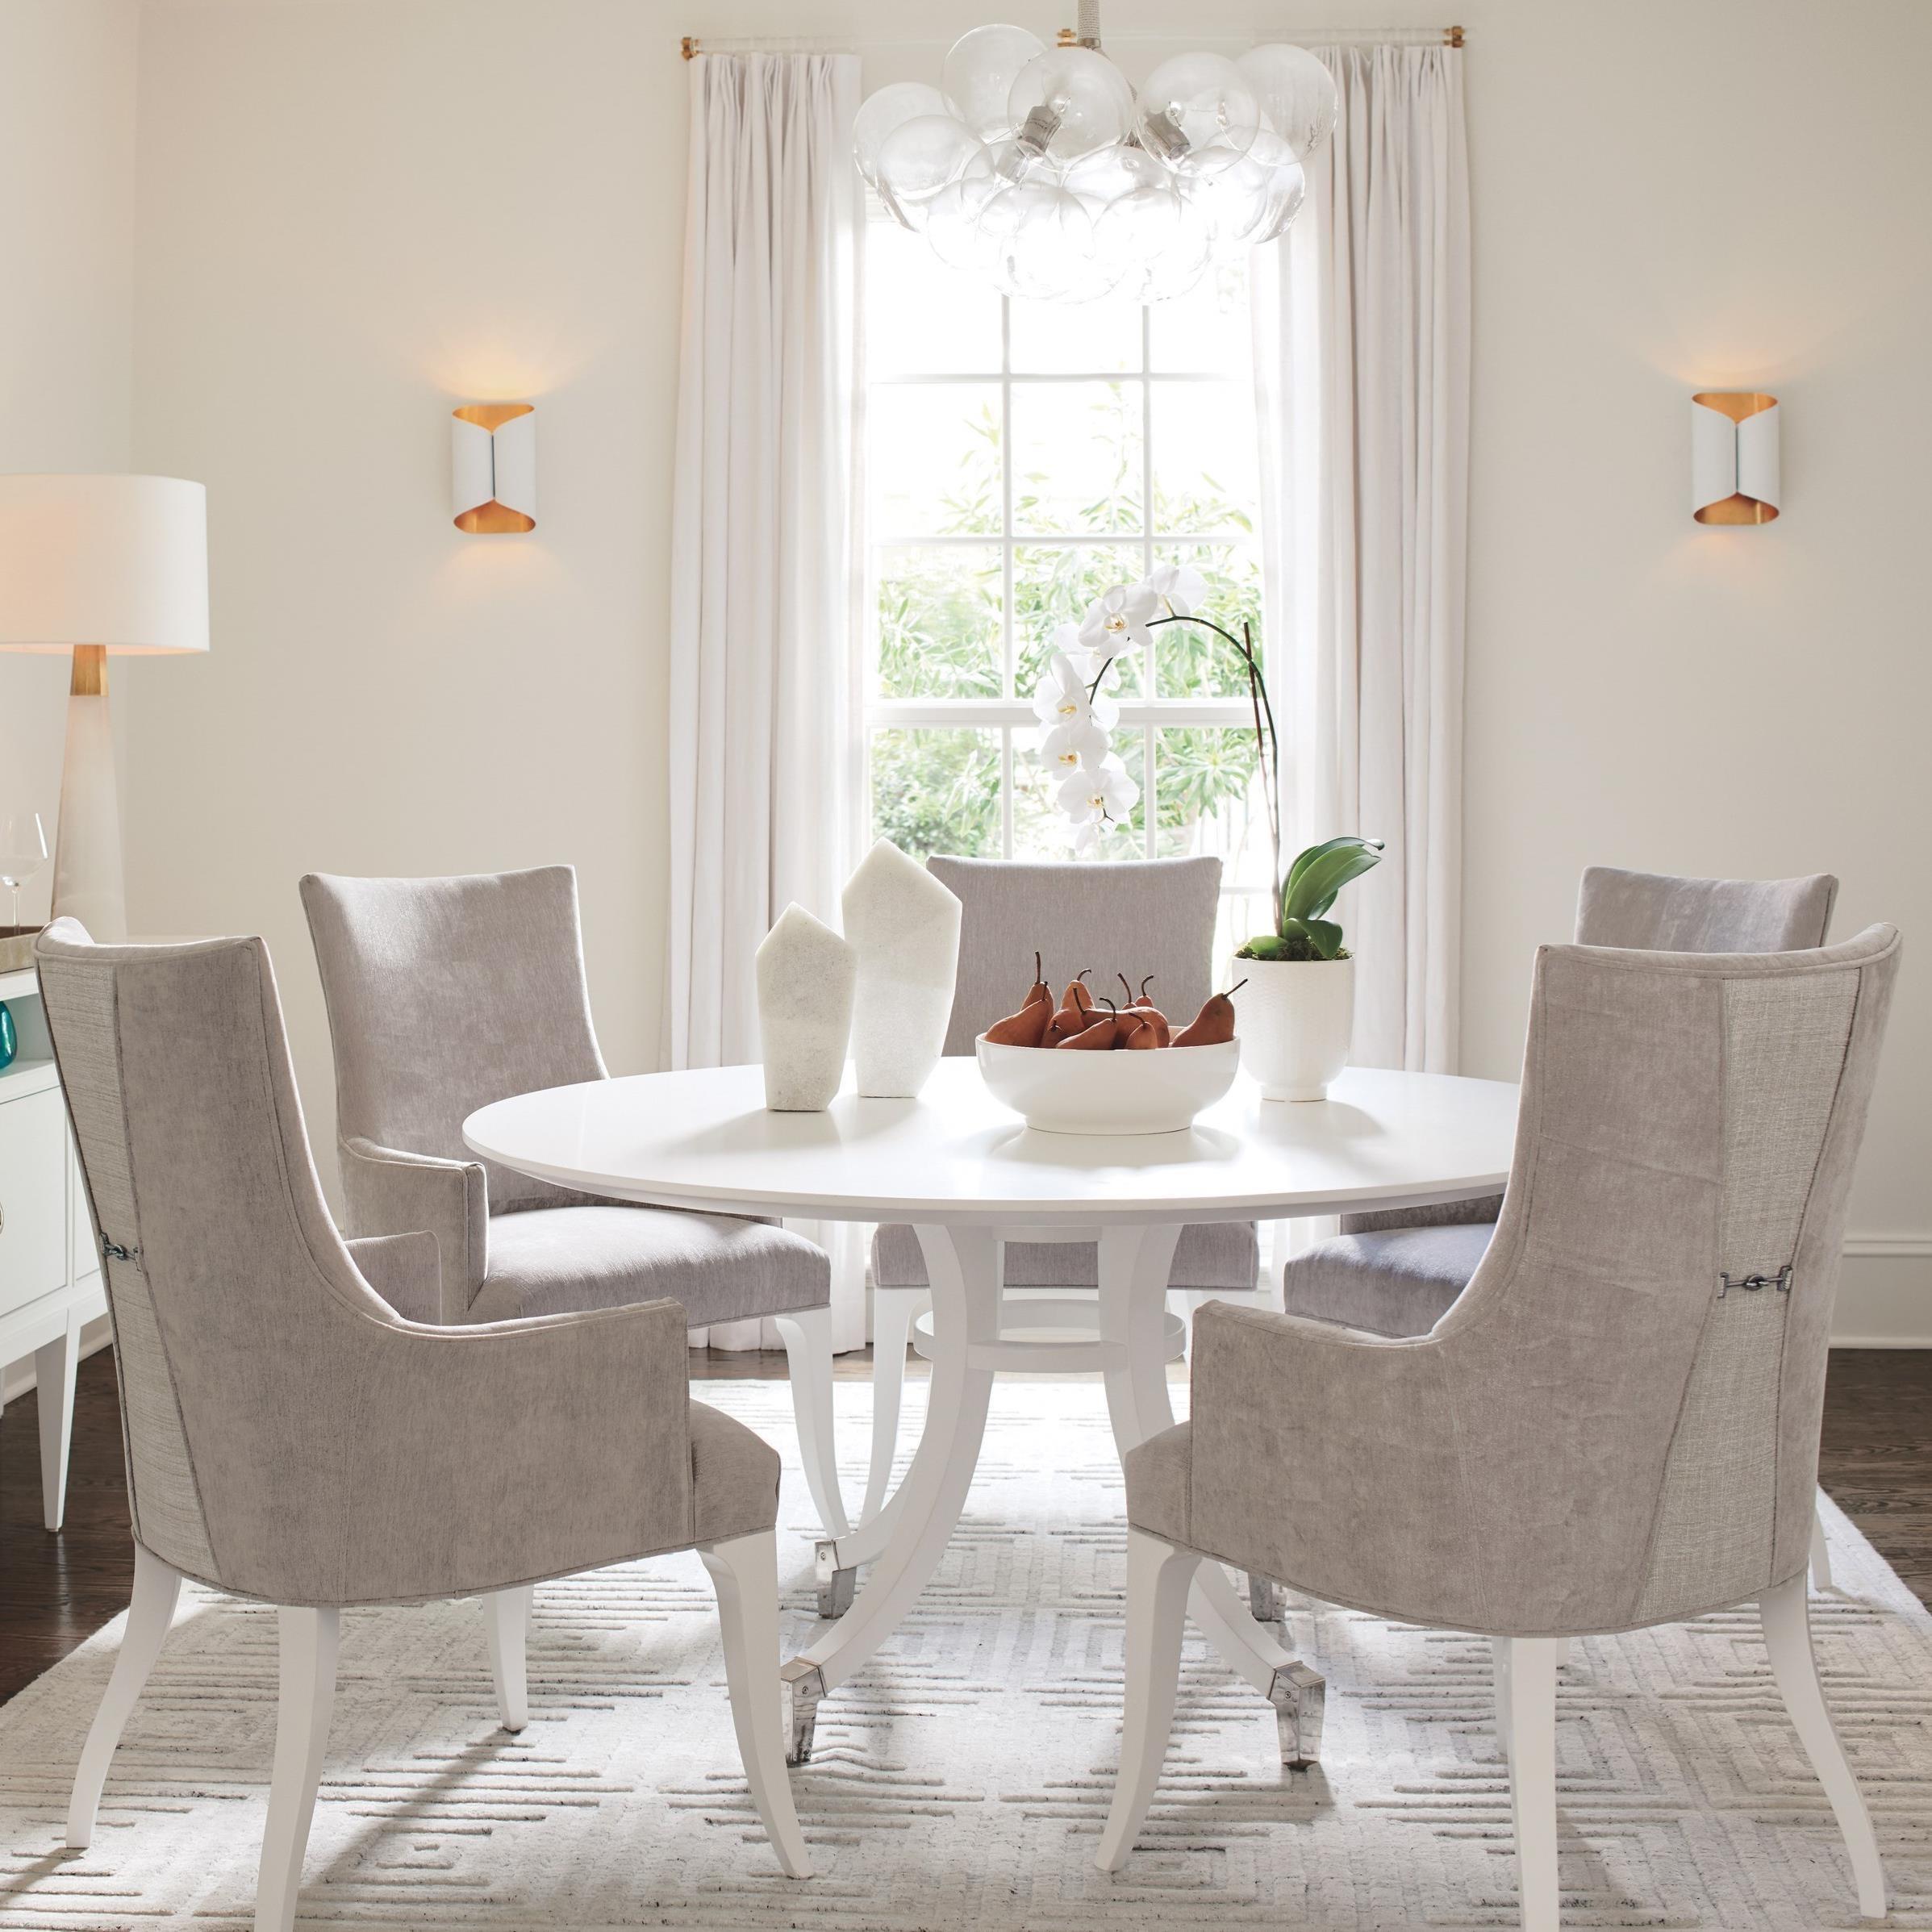 Avondale 6 Piece Dining Set by Lexington at Baer's Furniture